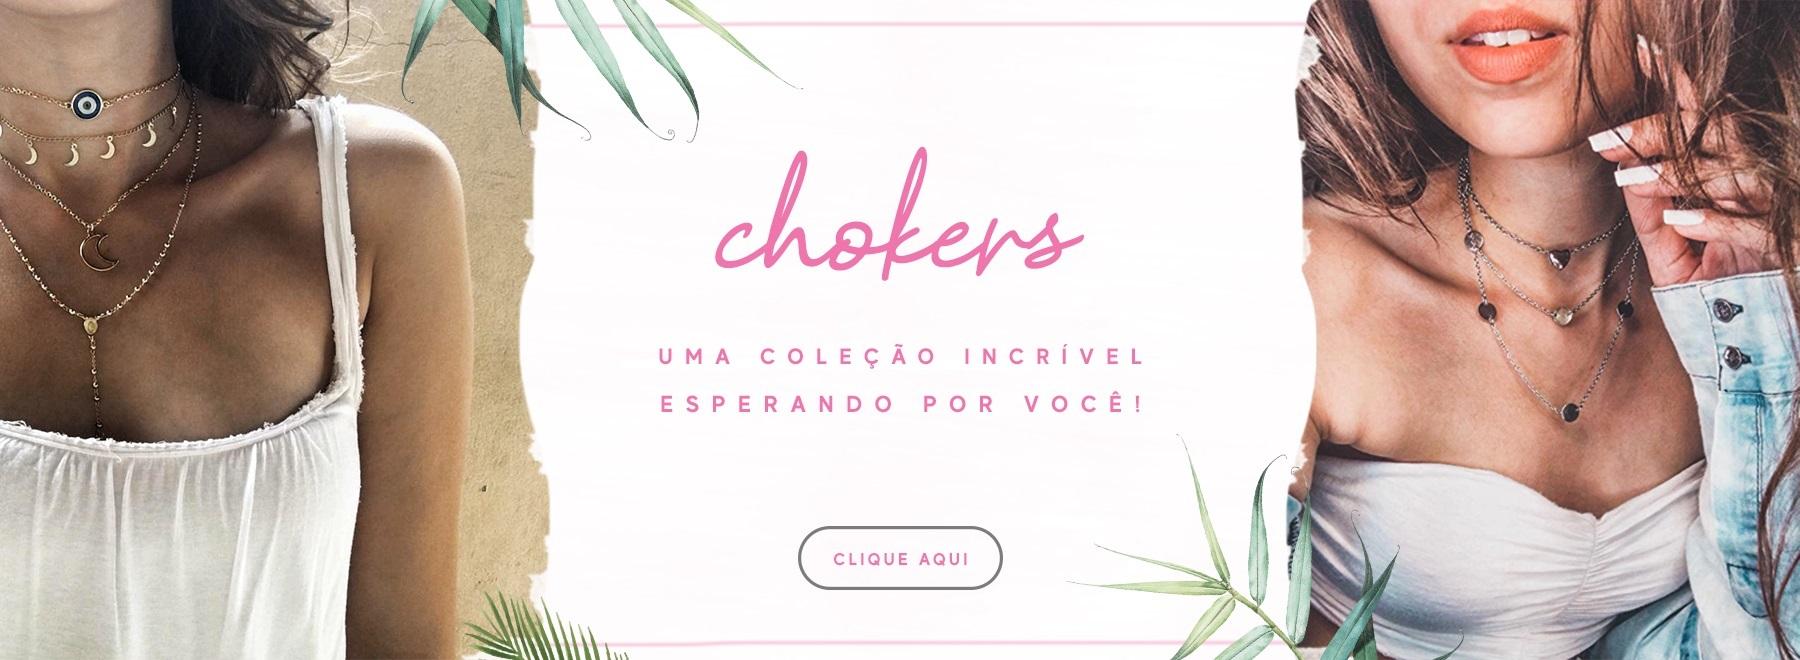 Chockers 2019